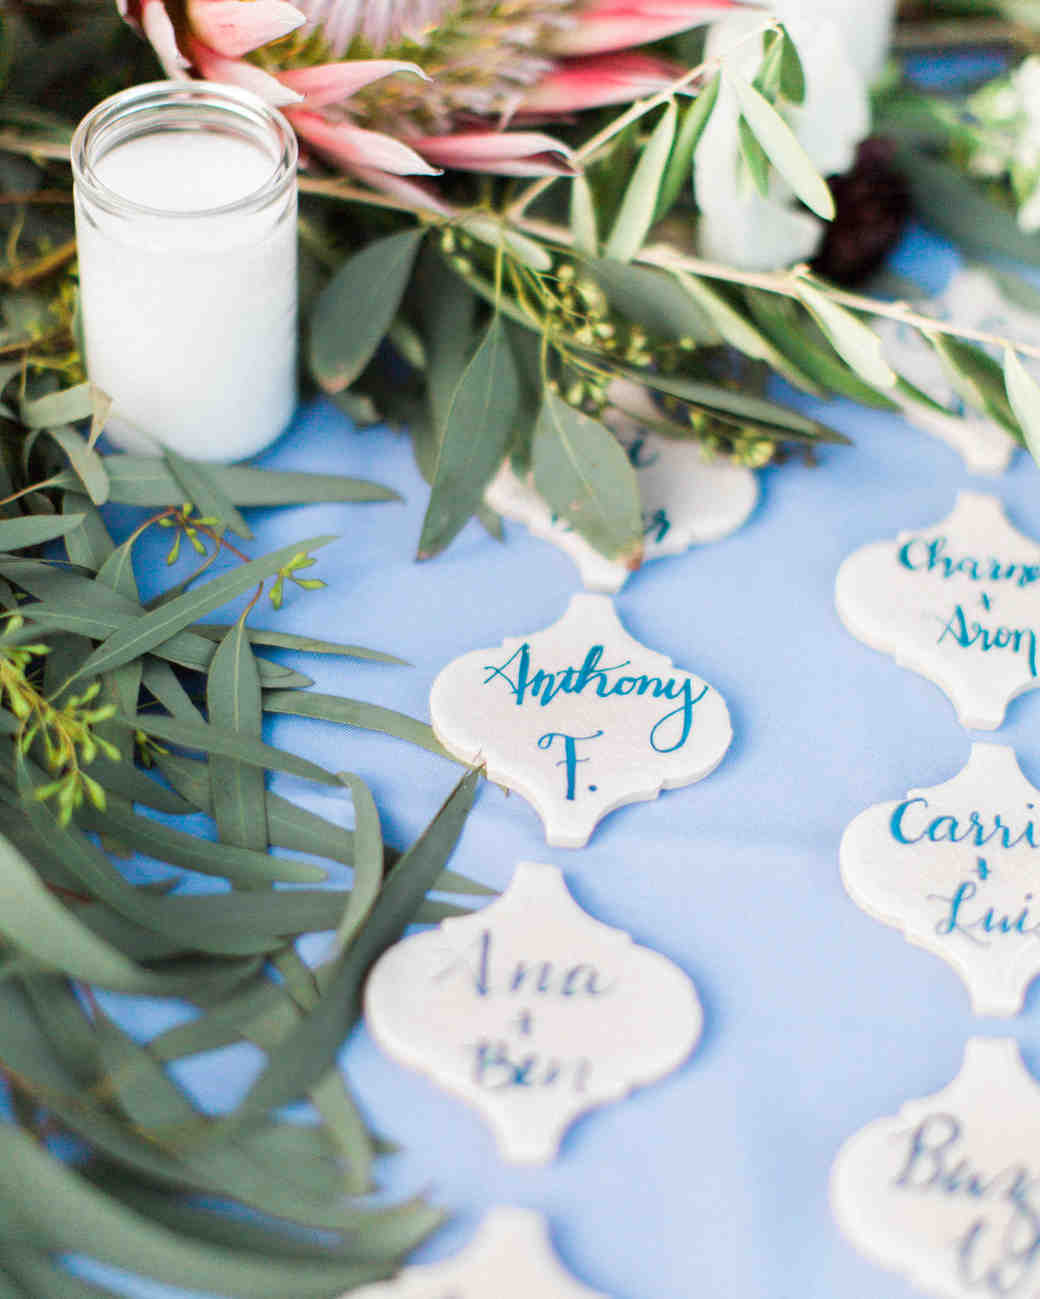 guests names on lantern-shaped escort card tiles